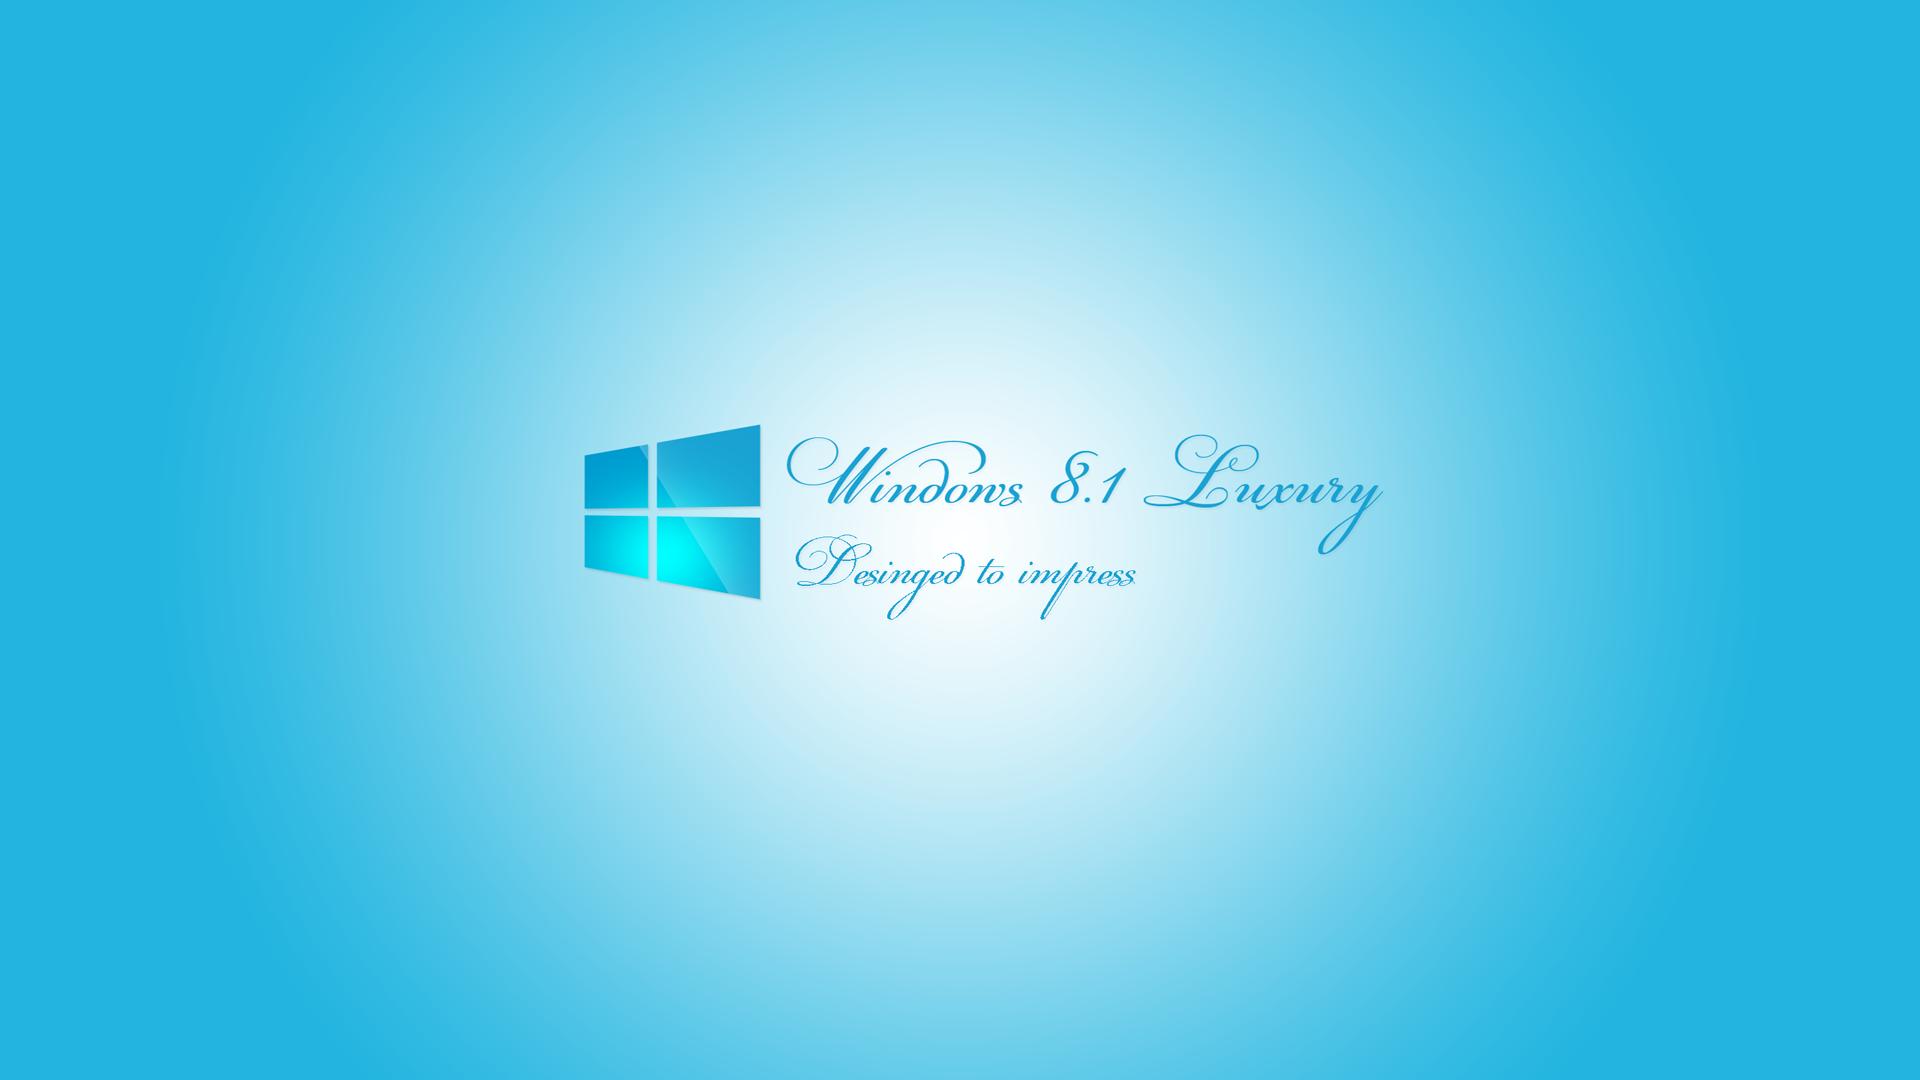 how to buy windows 8.1